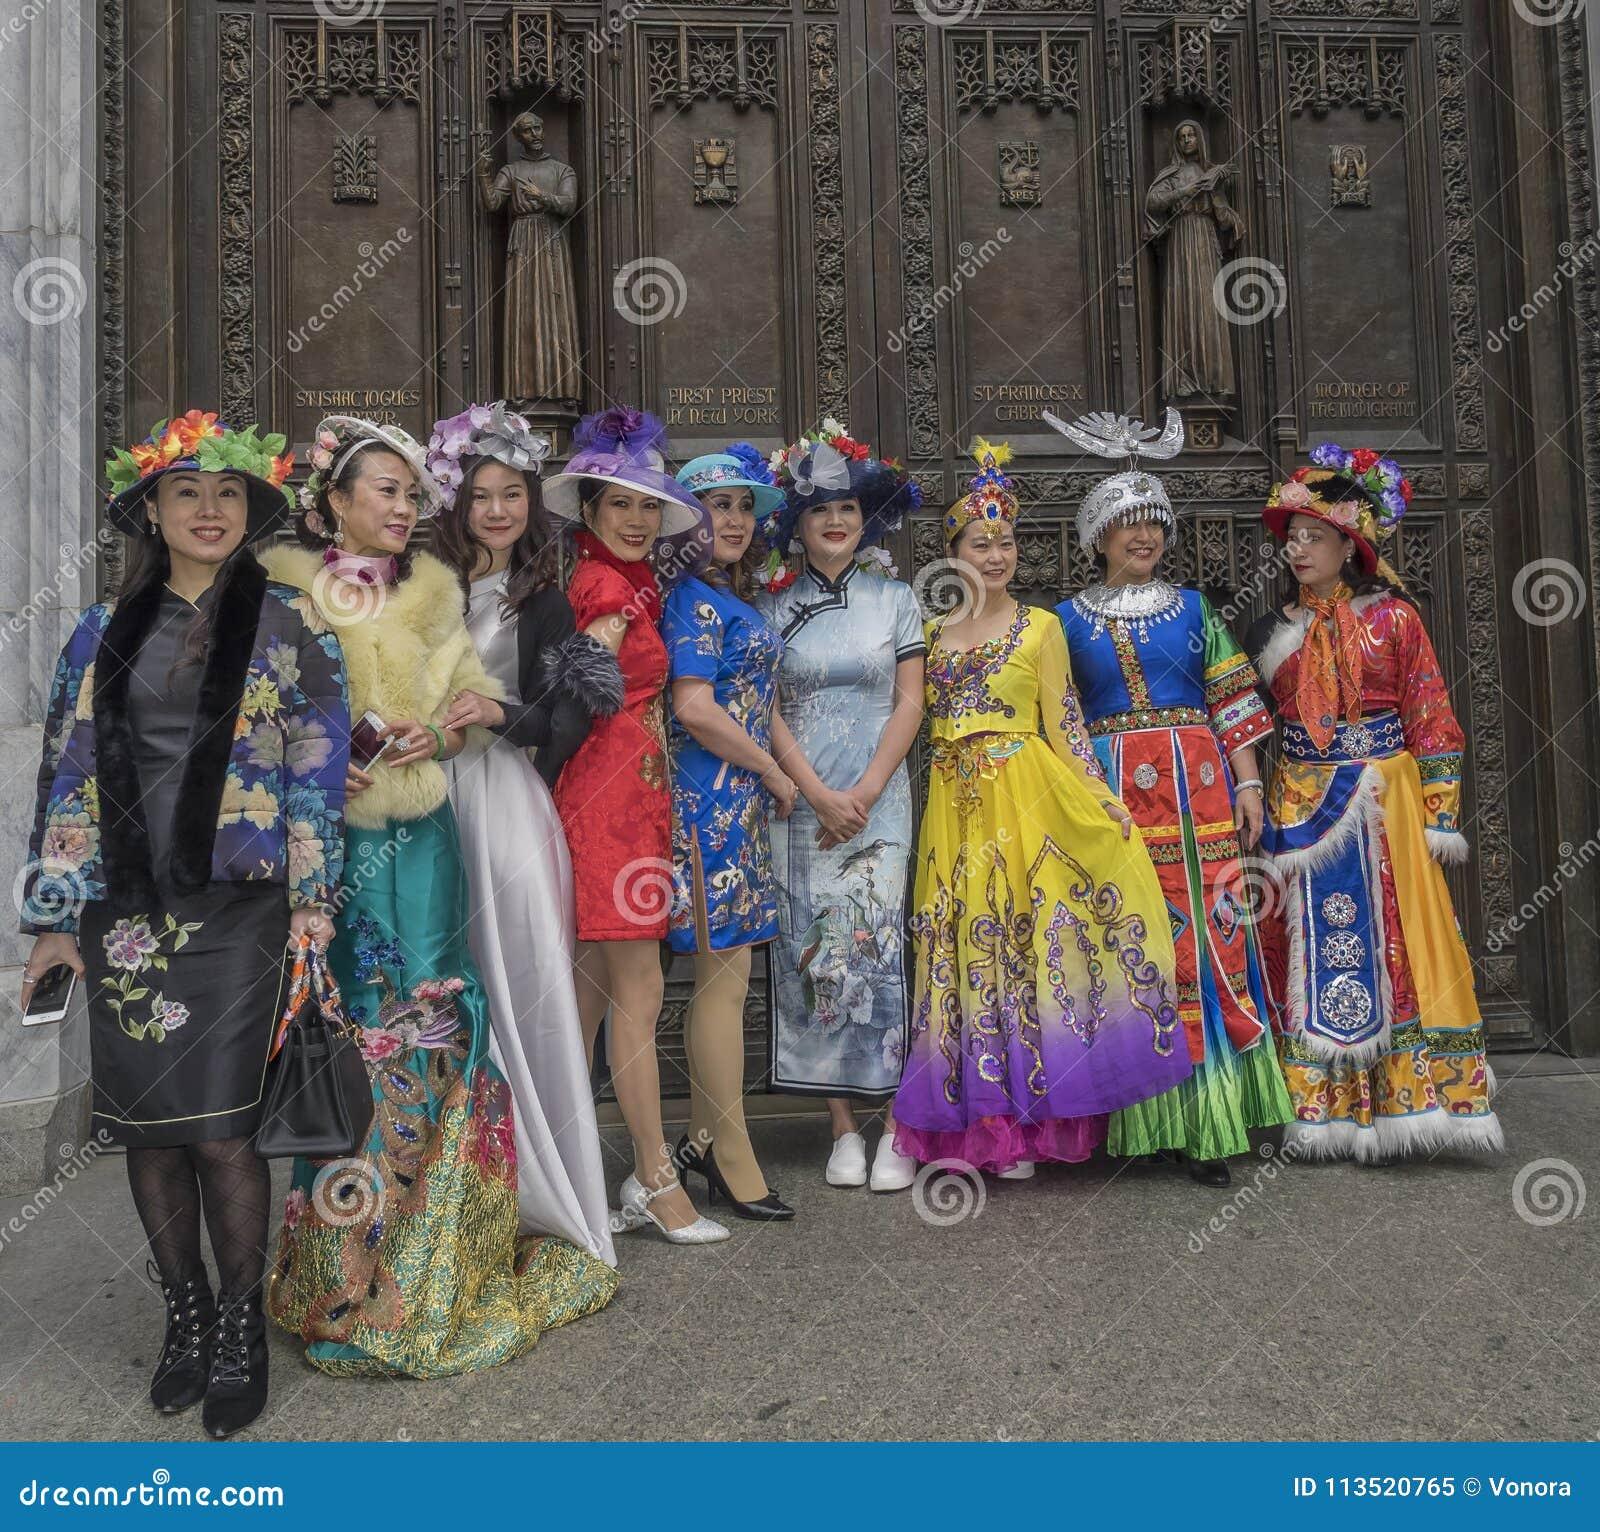 De Parade en de Bonnetfestival 2018 van Pasen